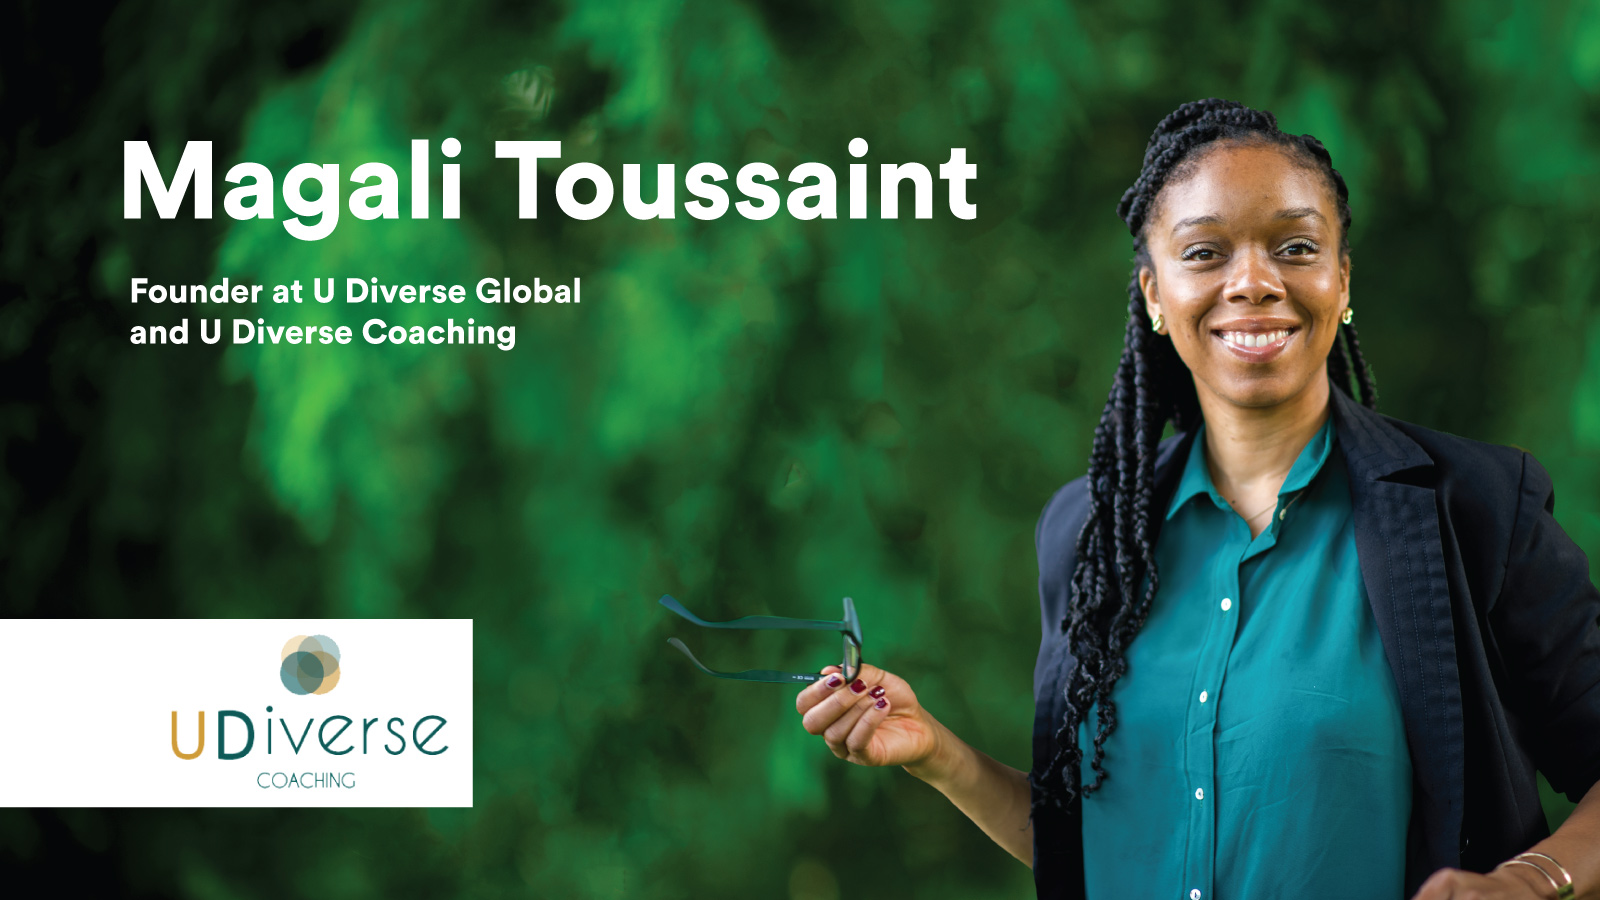 Magali-Toussaint-Founder-Of-U-Diverse-Coaching